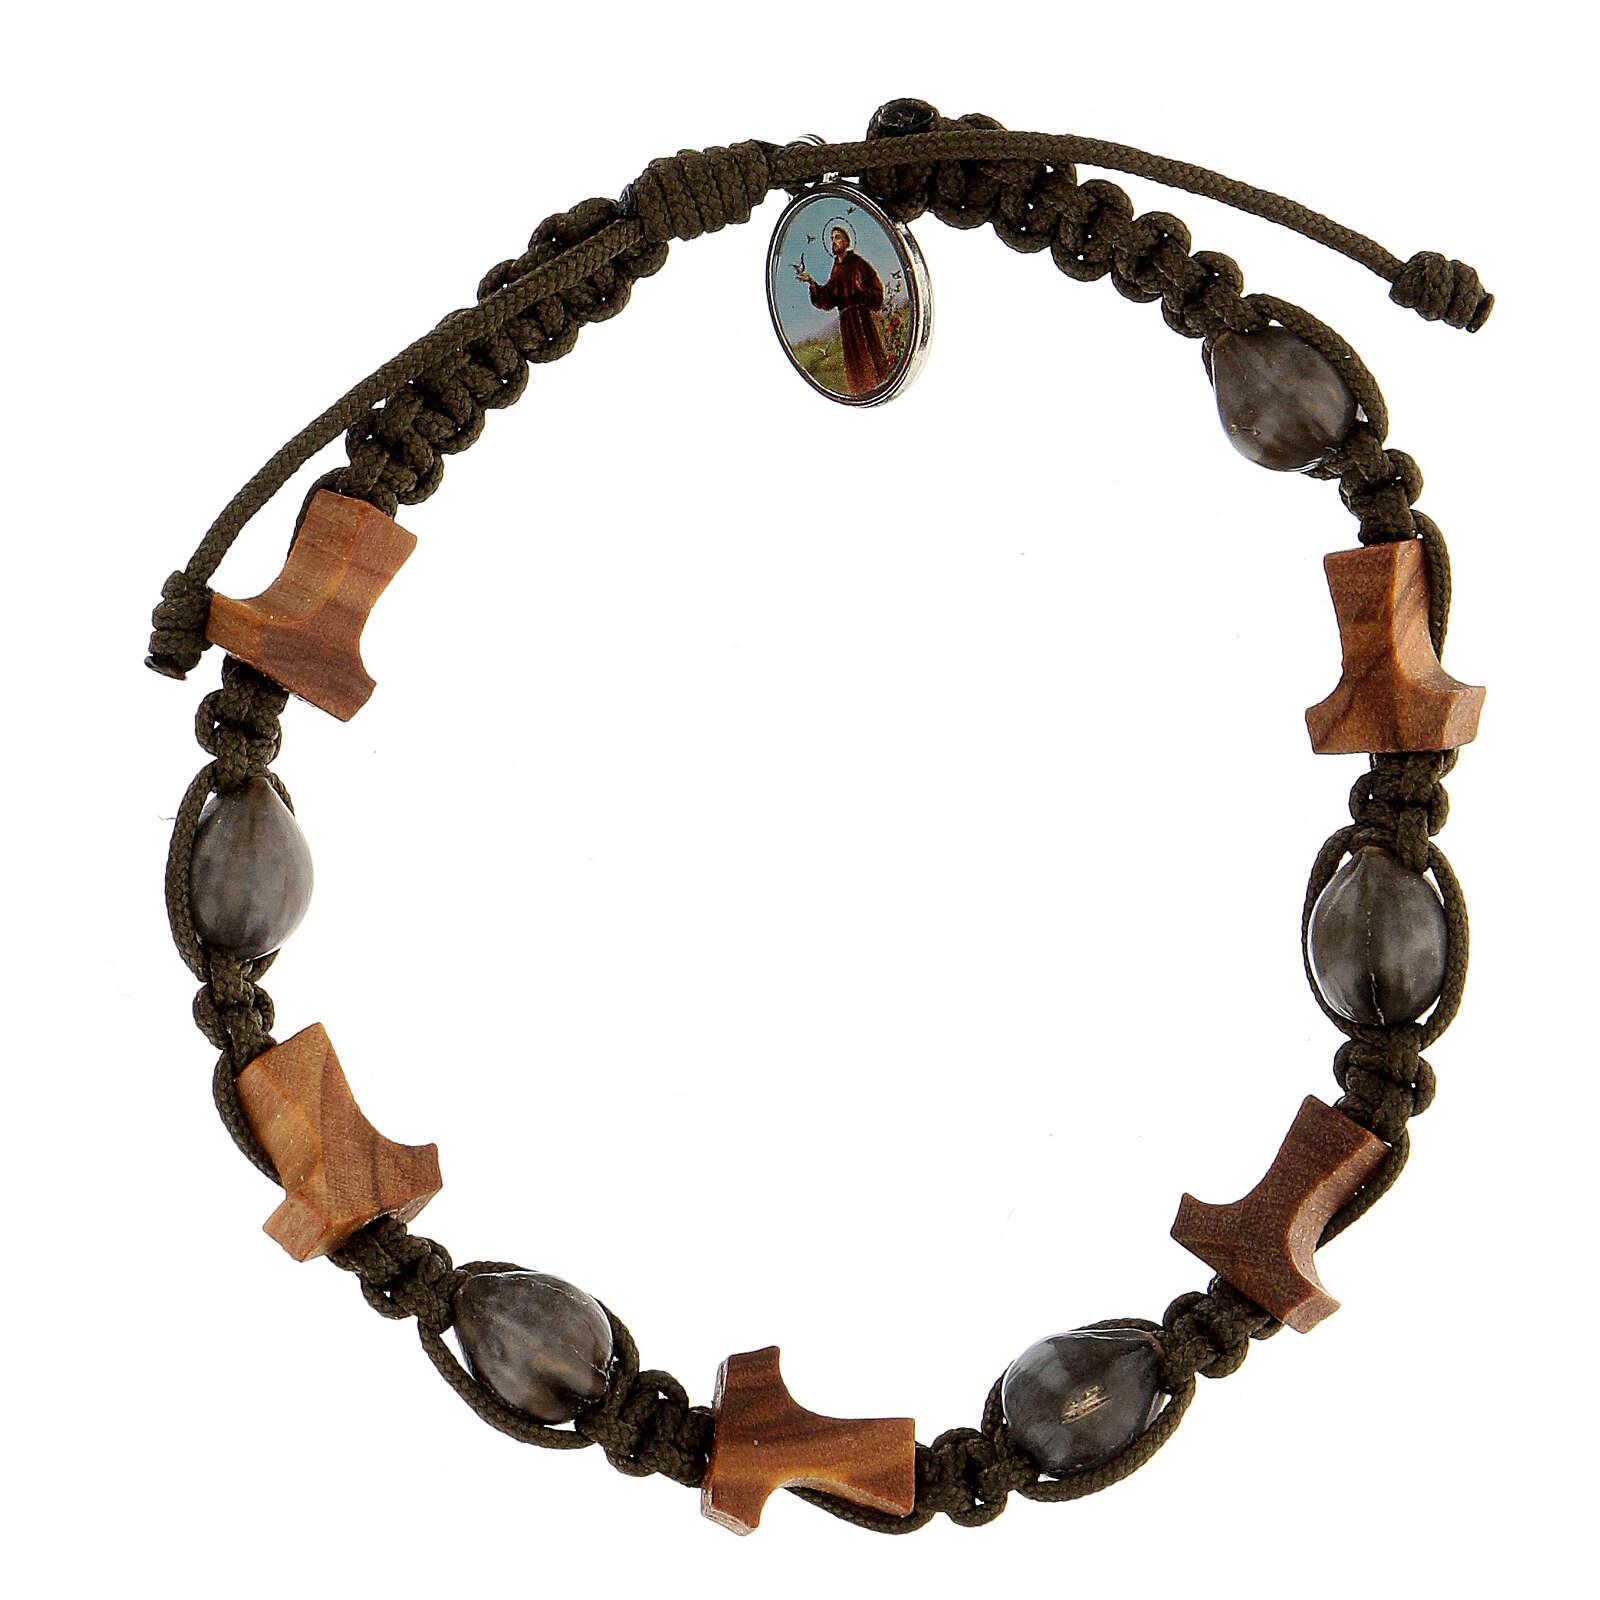 Bracelet Larmes-de-Job tau Medjugorje corde vert foncé 4